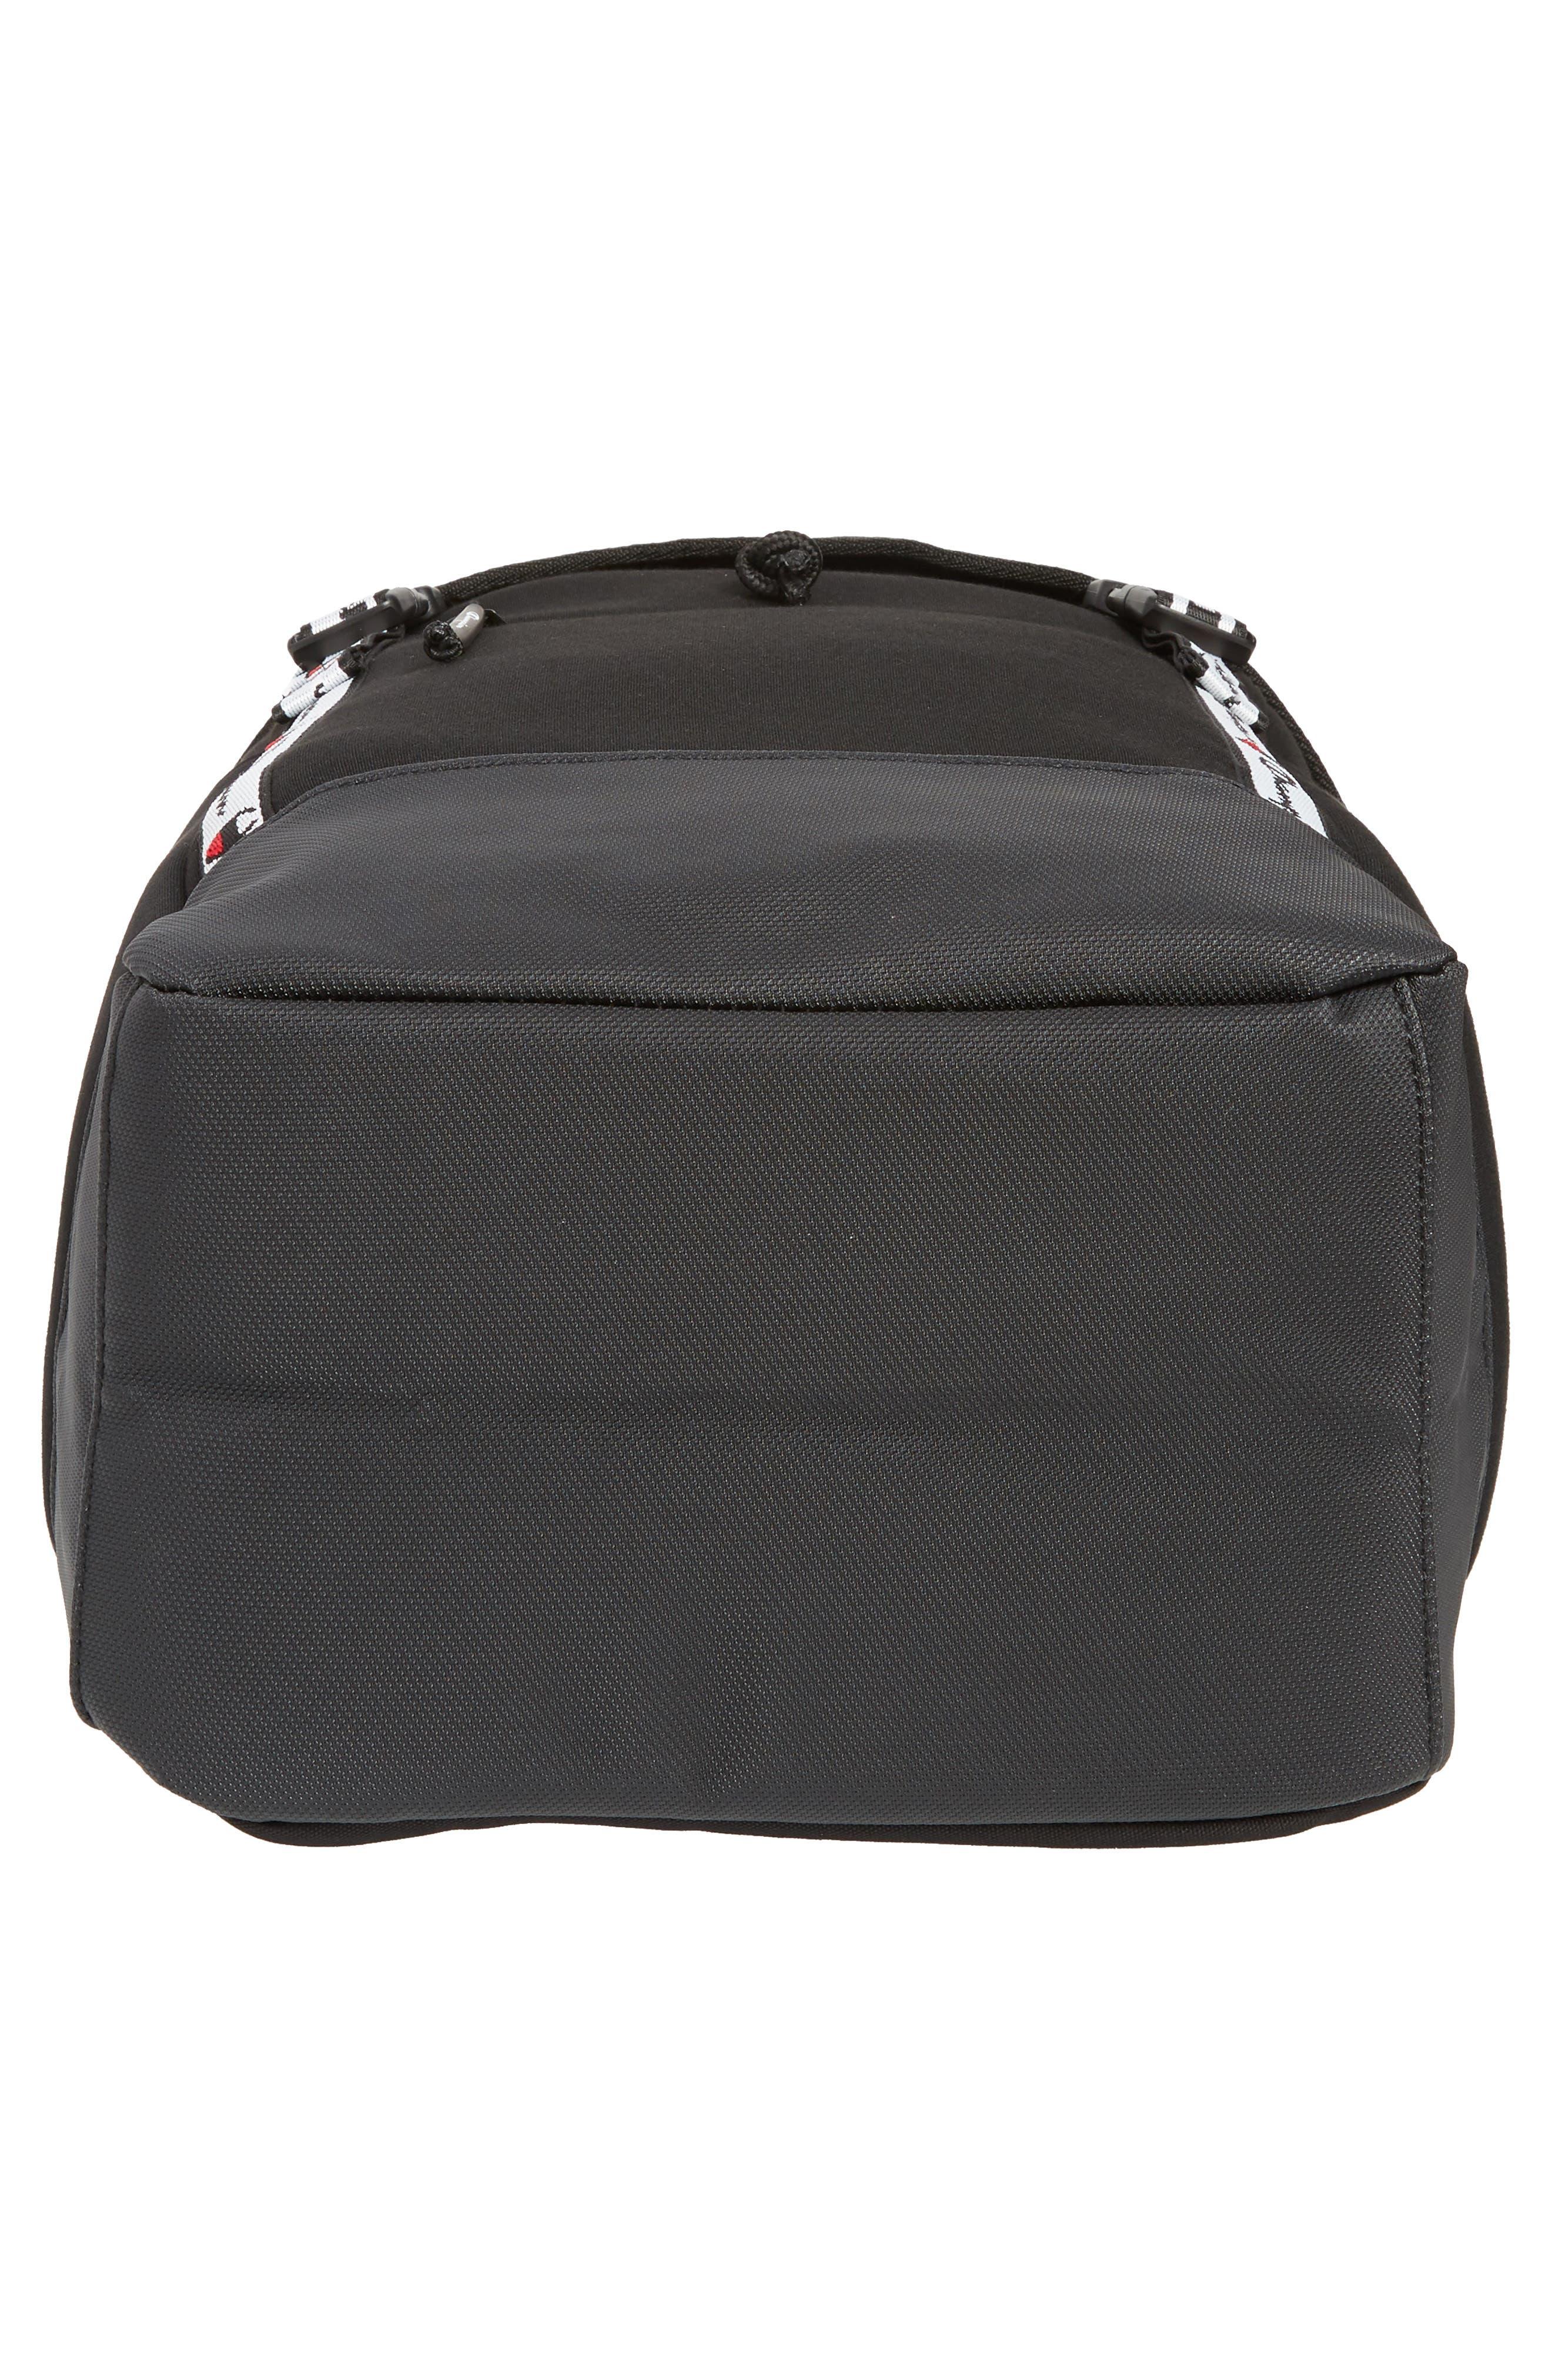 Top Load Backpack,                             Alternate thumbnail 6, color,                             BLACK